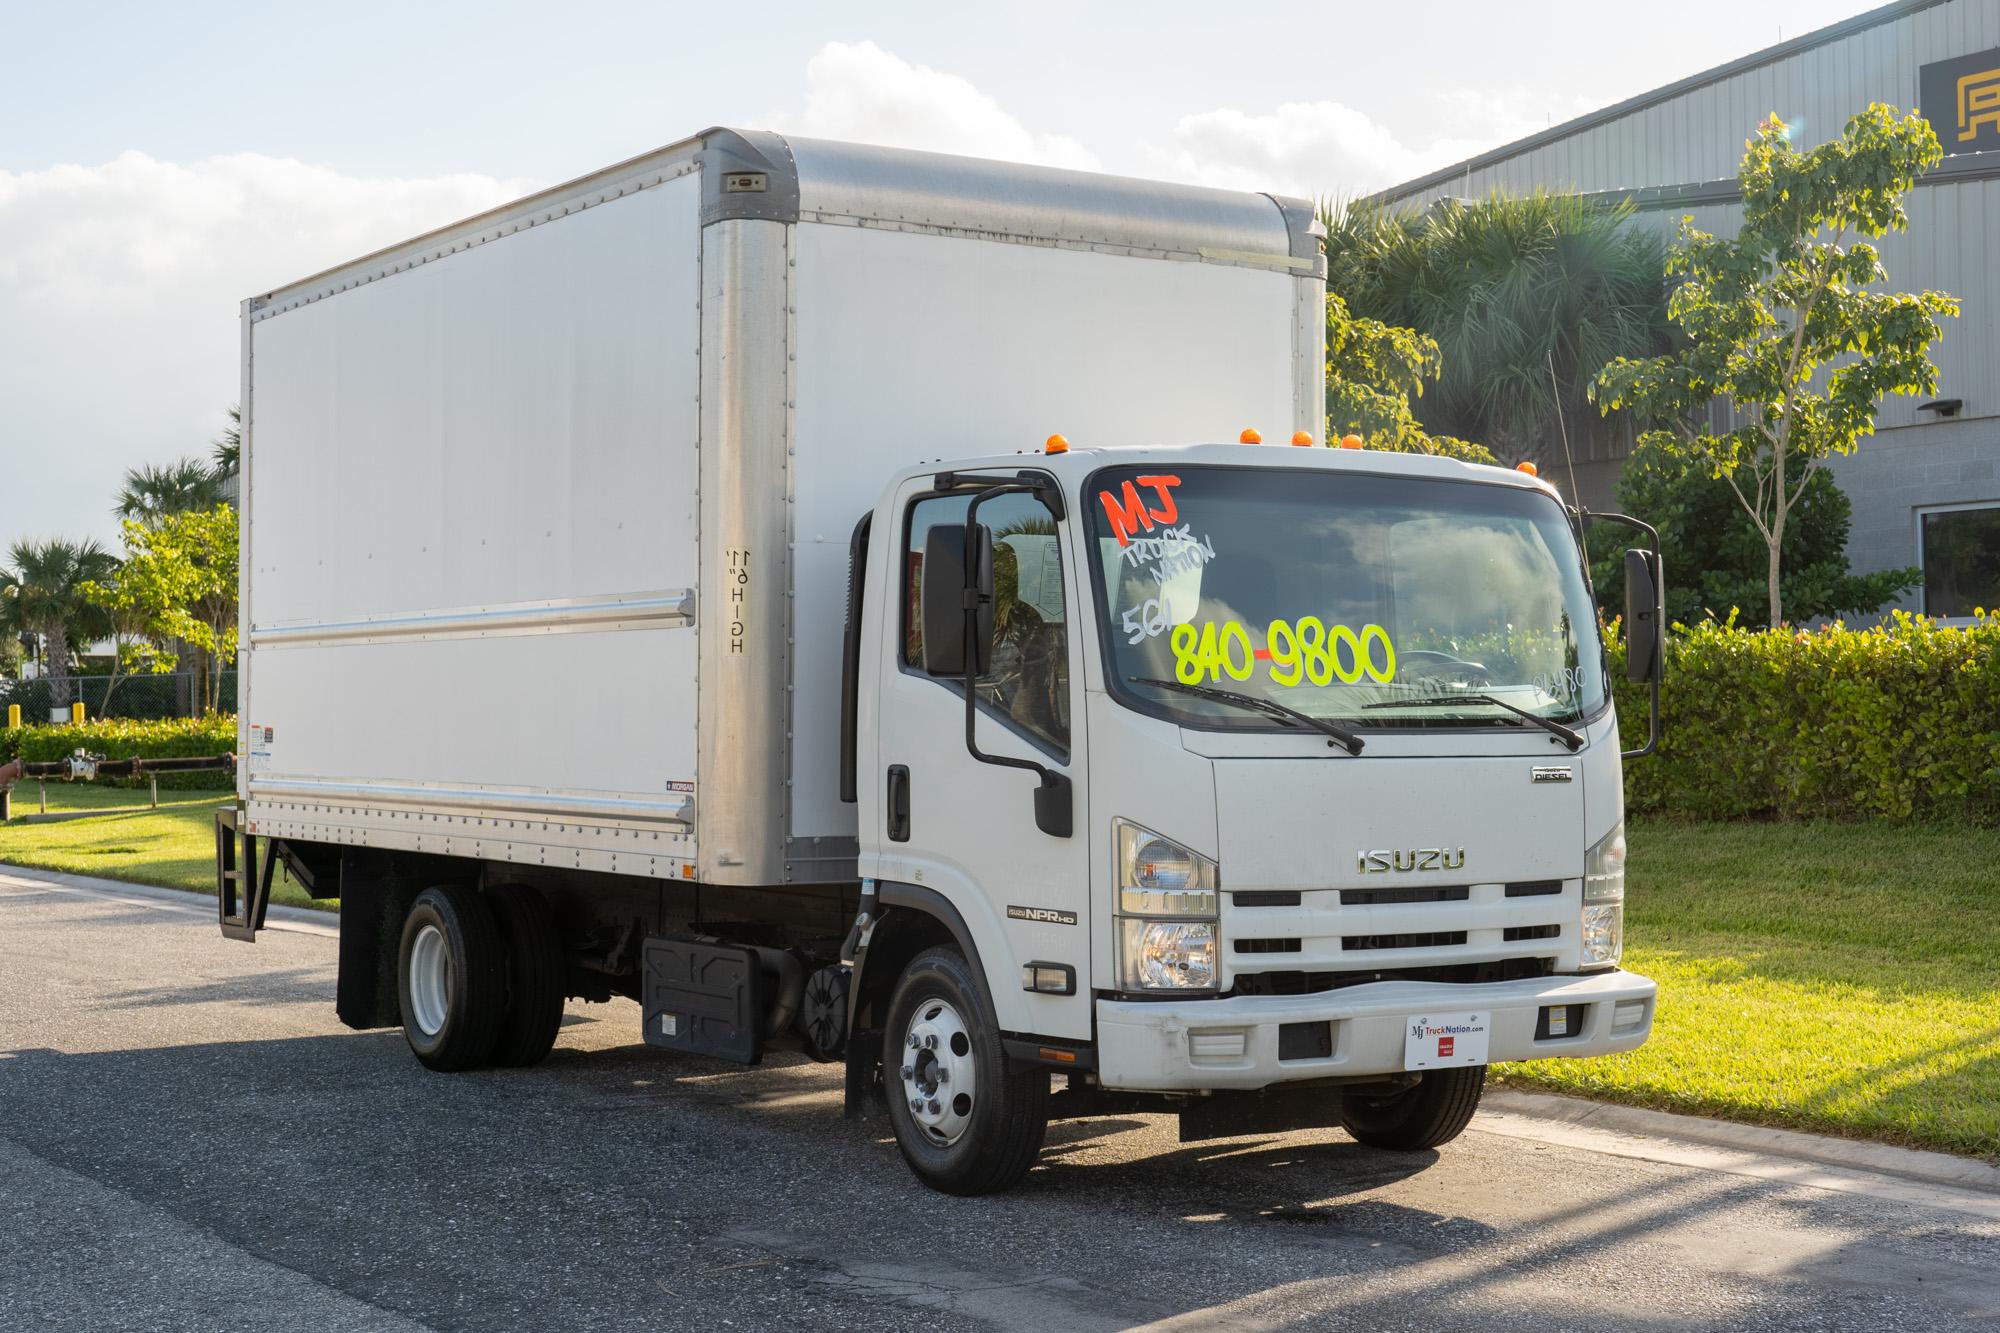 2015 Isuzu NPR-HD Box Truck with Palfinger Lift Gate 10